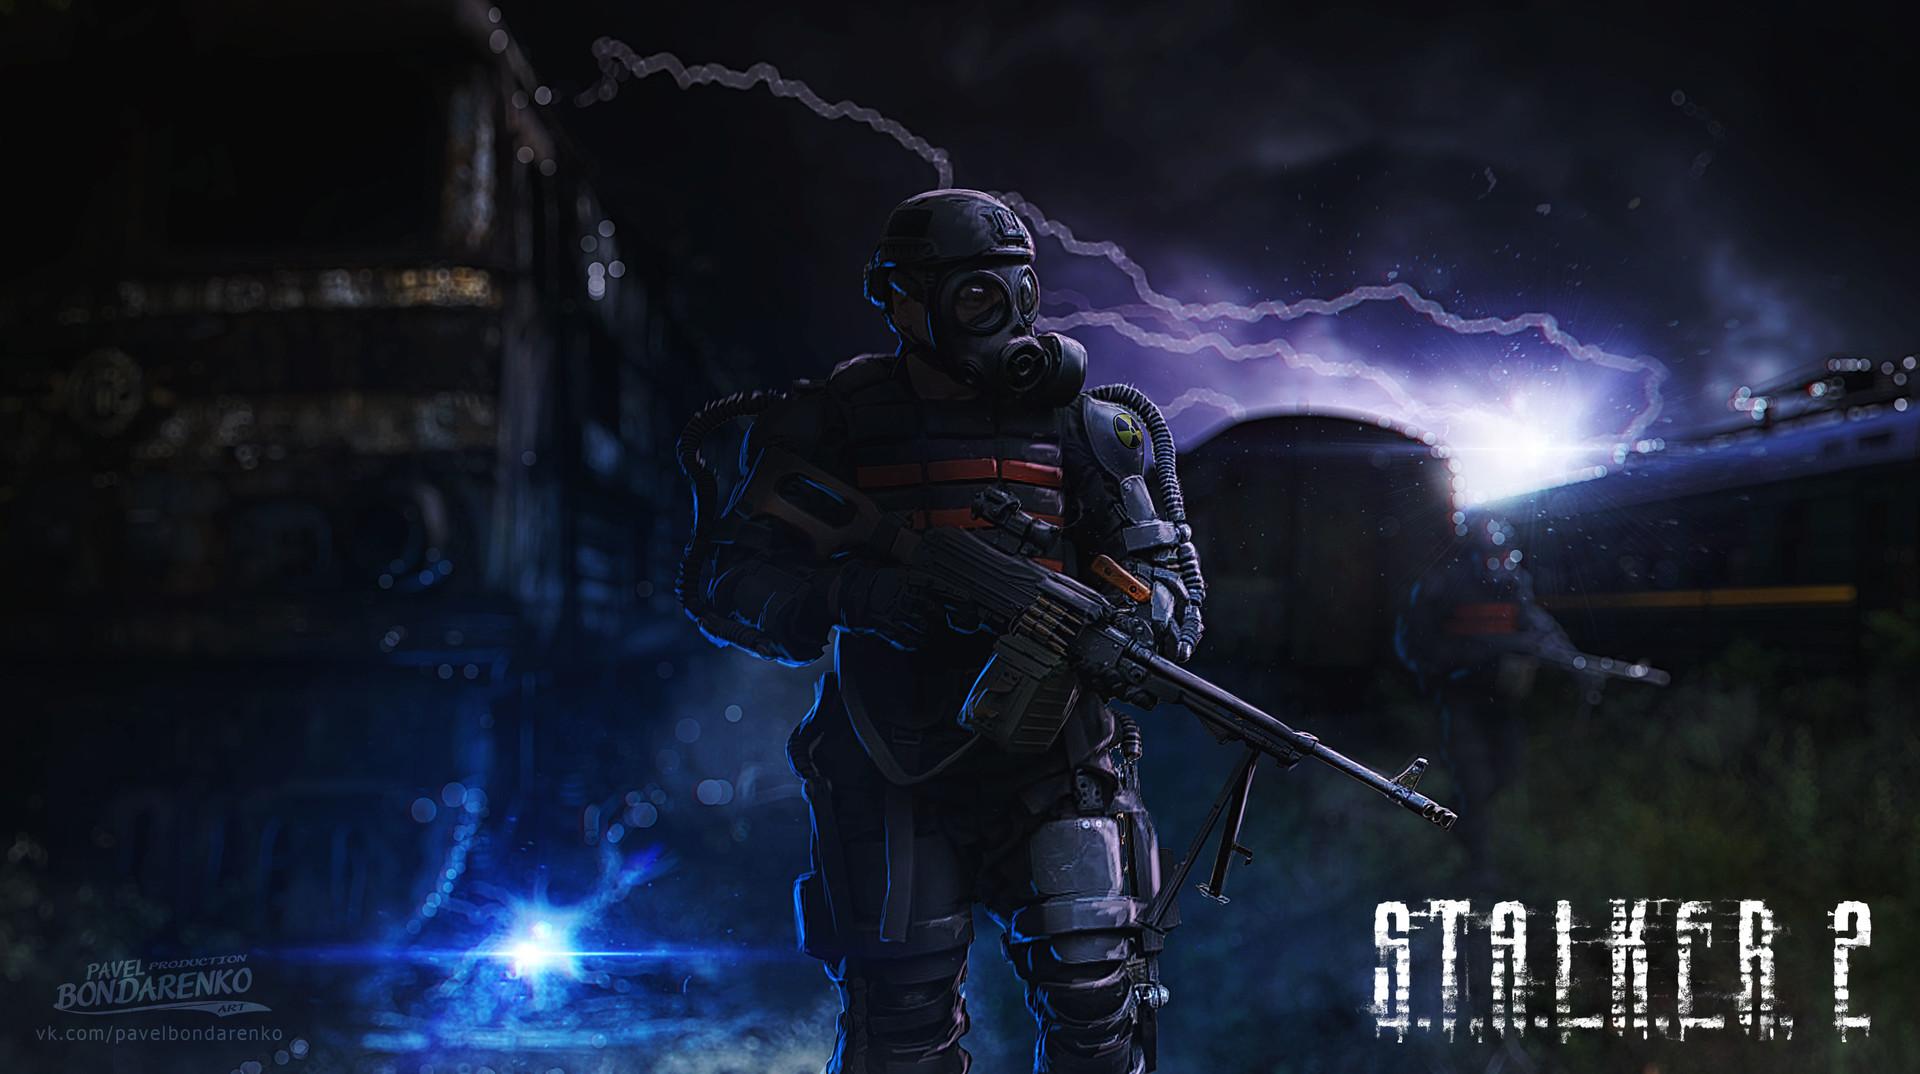 Разработчики S.T.A.L.K.E.R. 2 посетятGamescom 2019